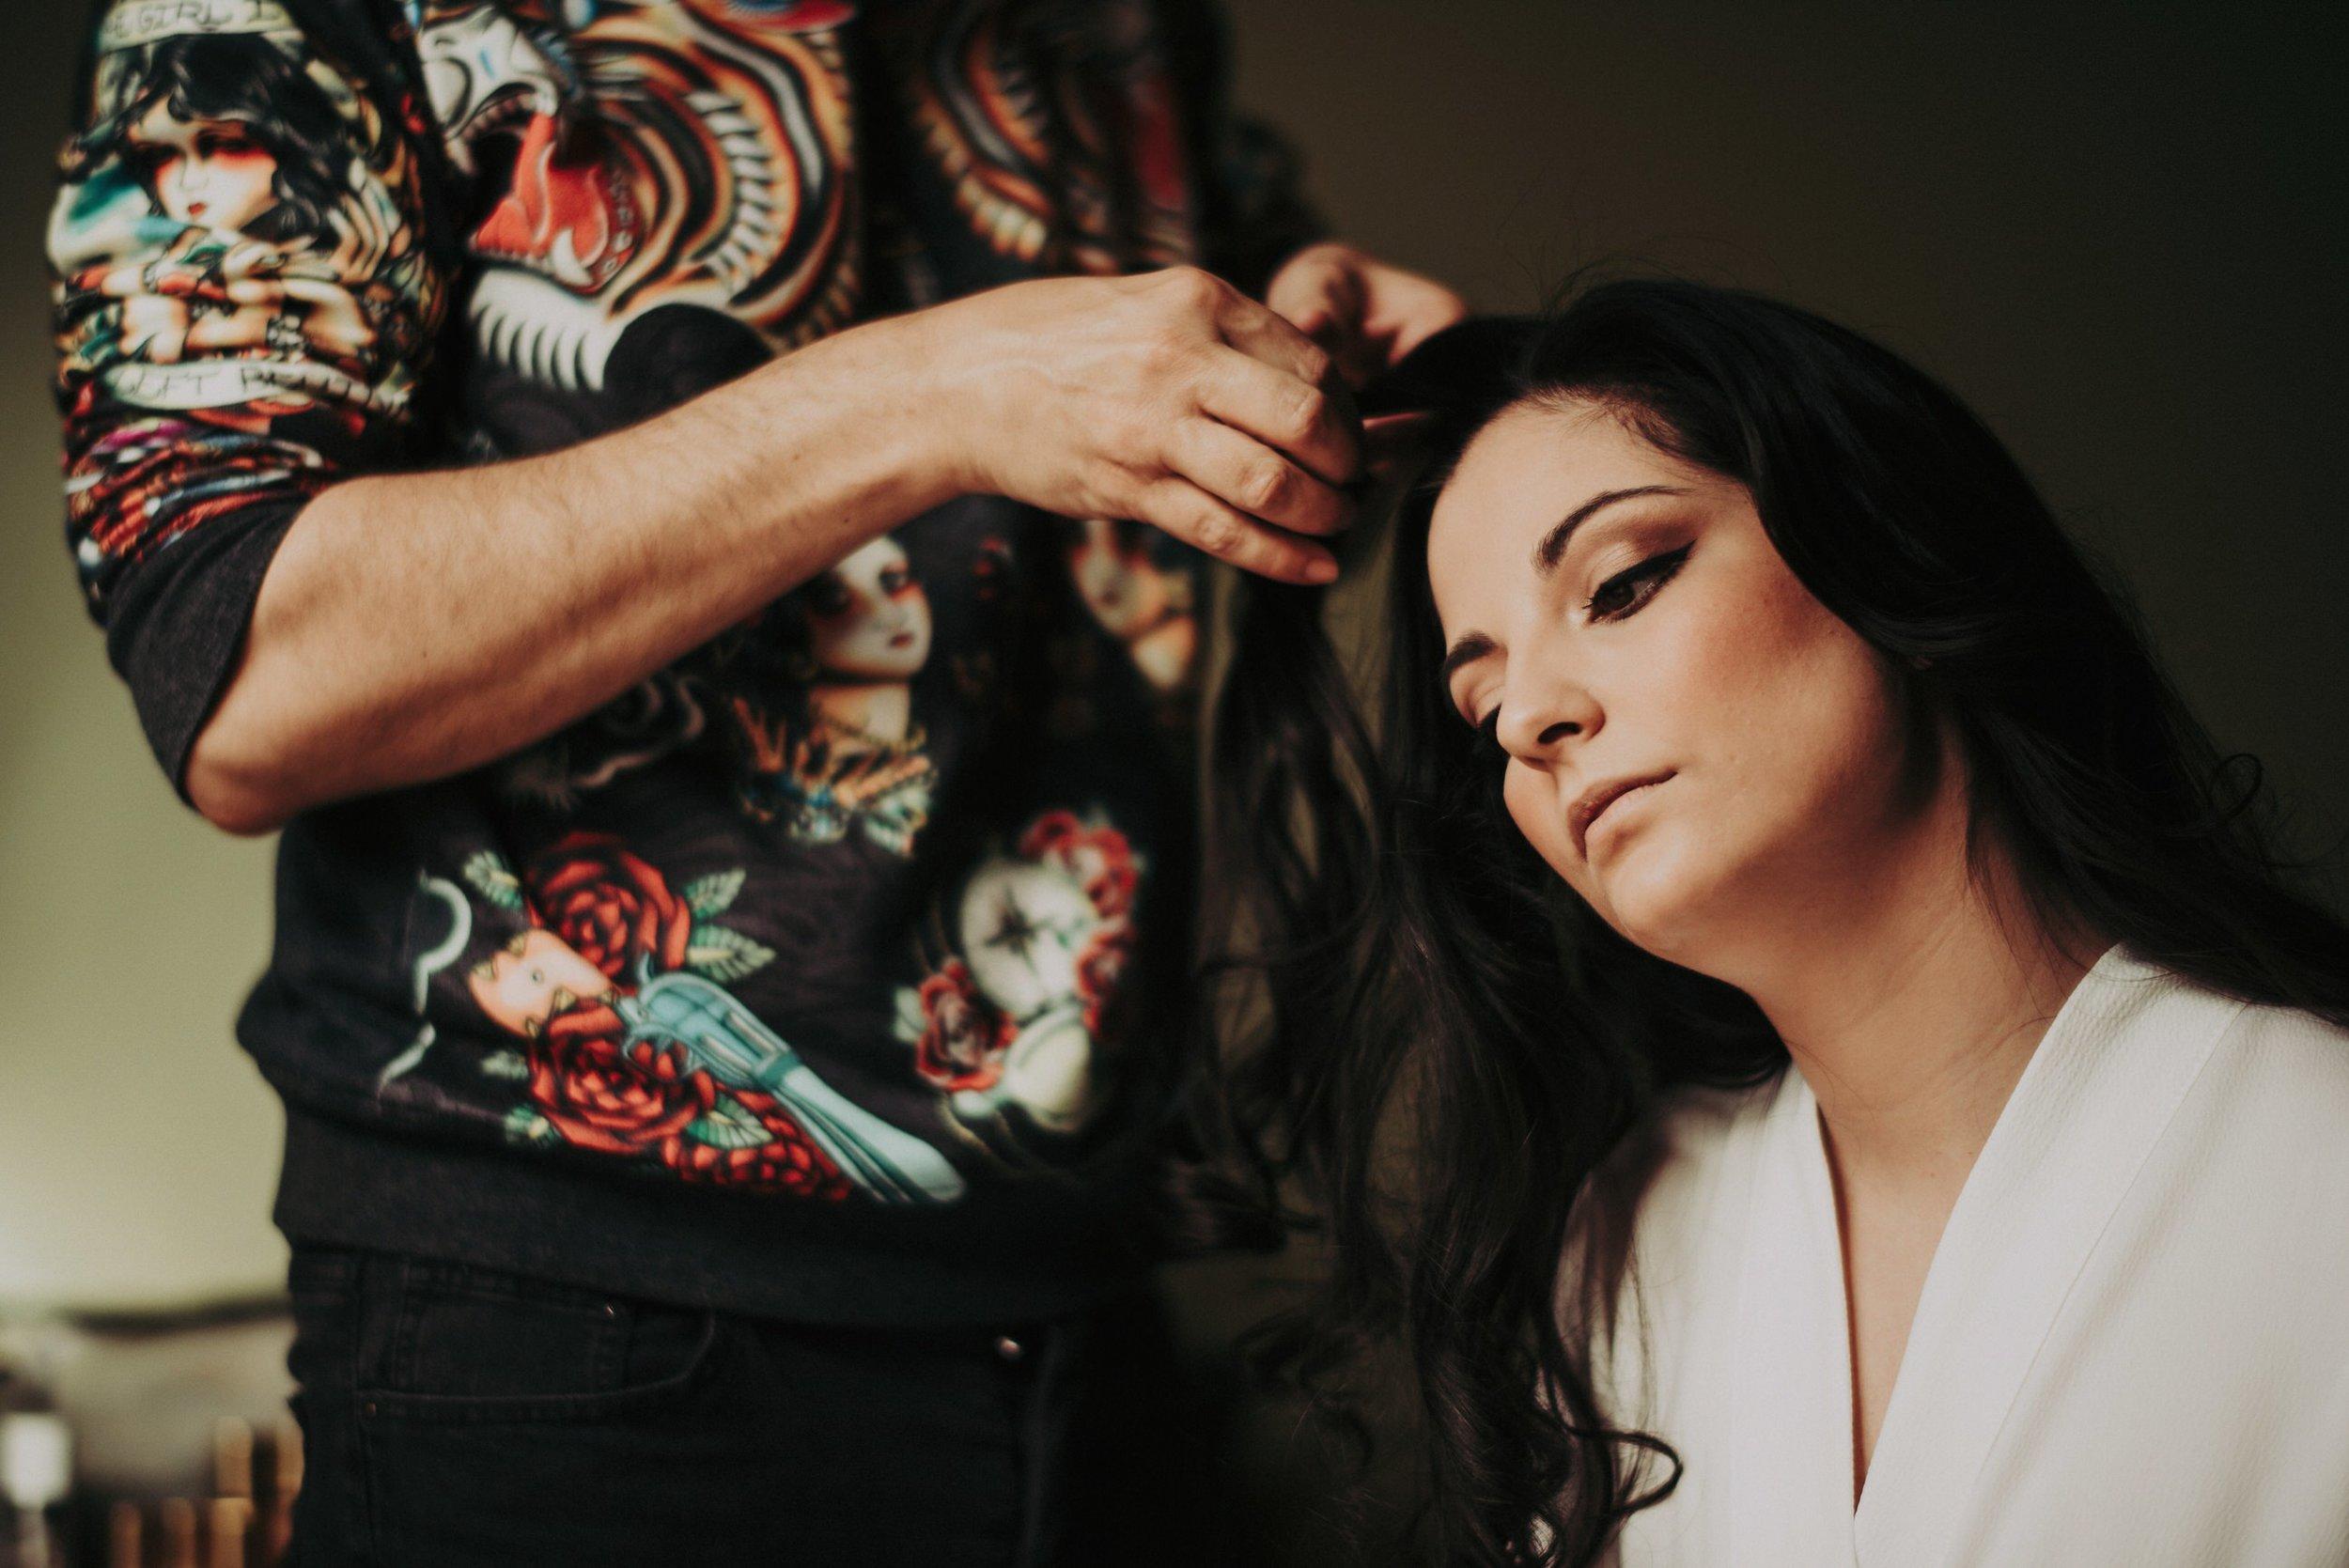 Laura & Rubén - boda en utrera - Santa clotilde- Manolo mayo - Fotografo de boda - Andrés Amarillo AAA_1075-Exposure (64).jpg